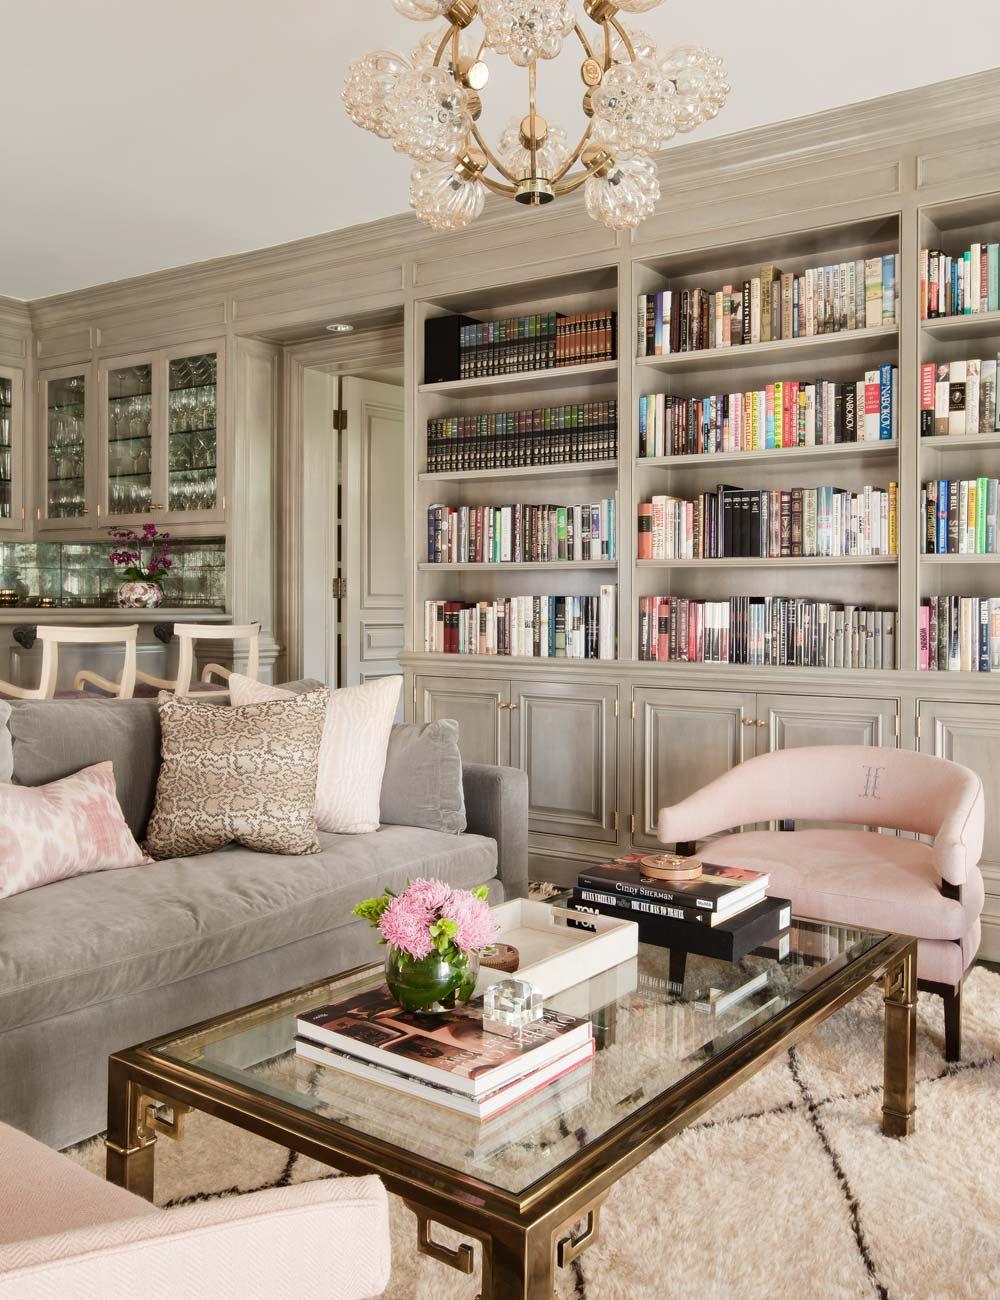 Pastel id interior design also new house ideas room home living rh pinterest